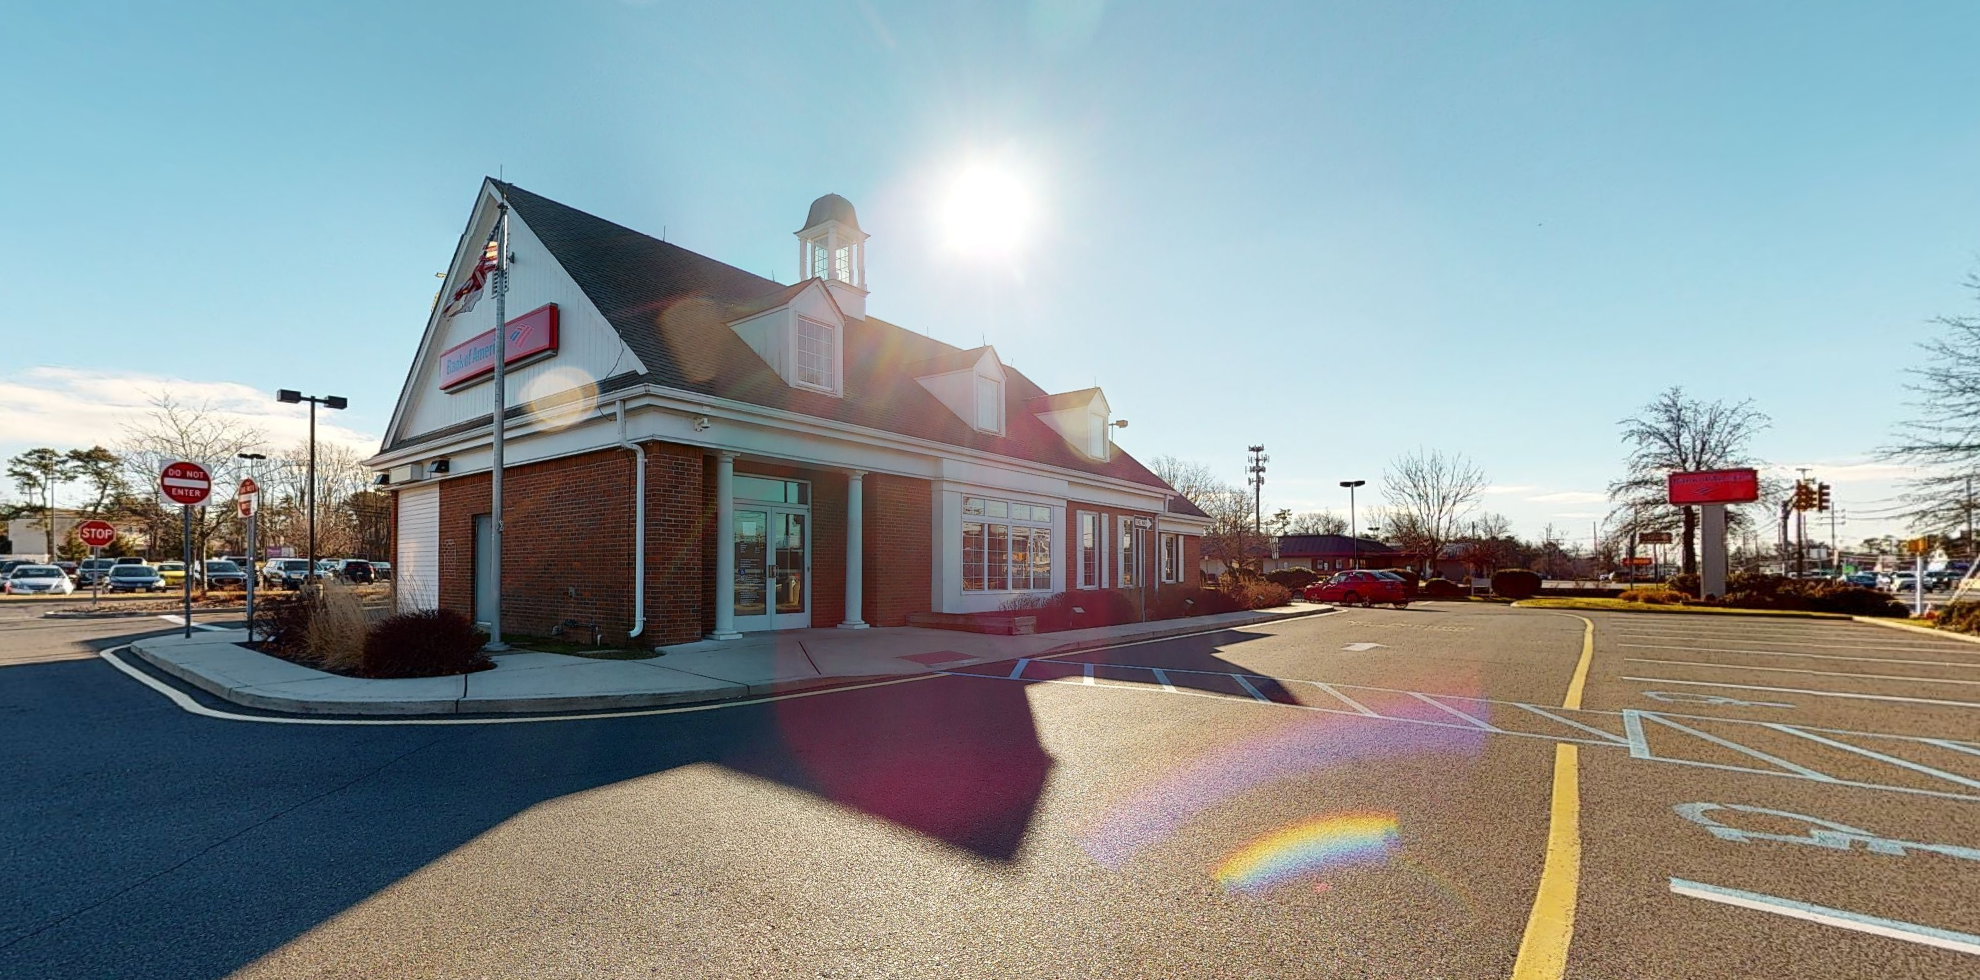 Bank of America financial center with drive-thru ATM   39 Brick Blvd, Brick Township, NJ 08723